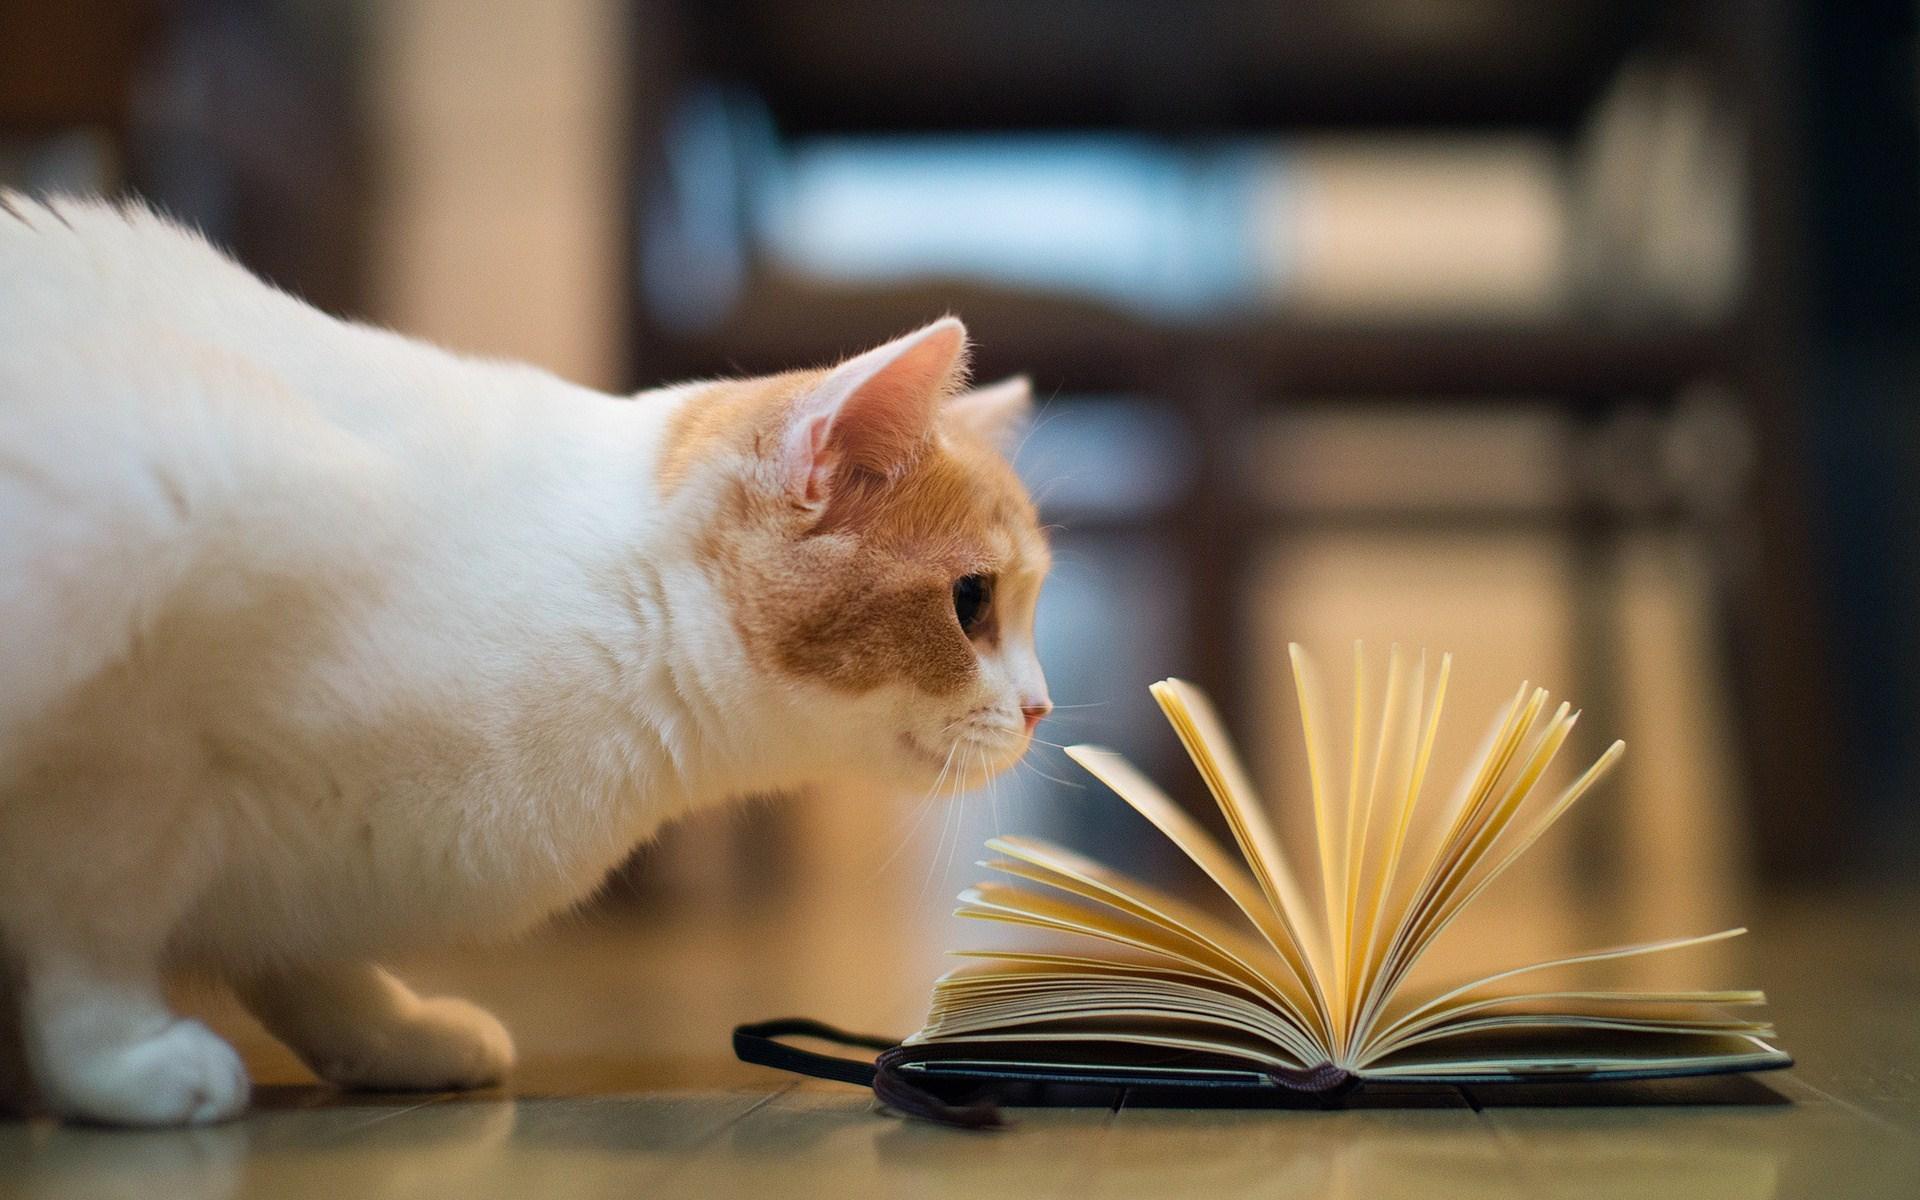 Cute Live Wallpaper Download Cat Books Hd Desktop Wallpapers 4k Hd